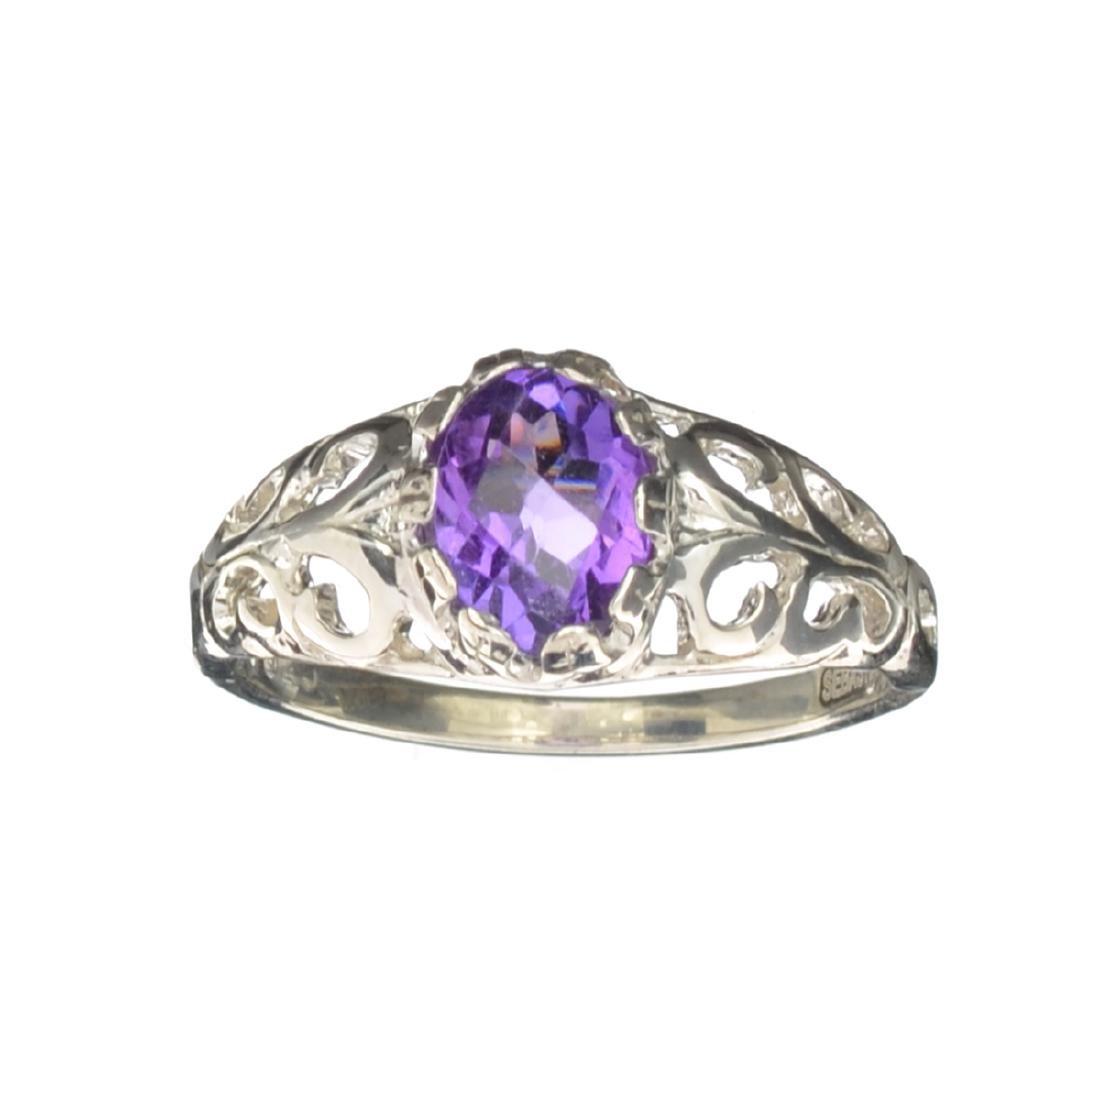 APP: 0.5k Fine Jewelry Designer Sebastian, 1.08CT Oval